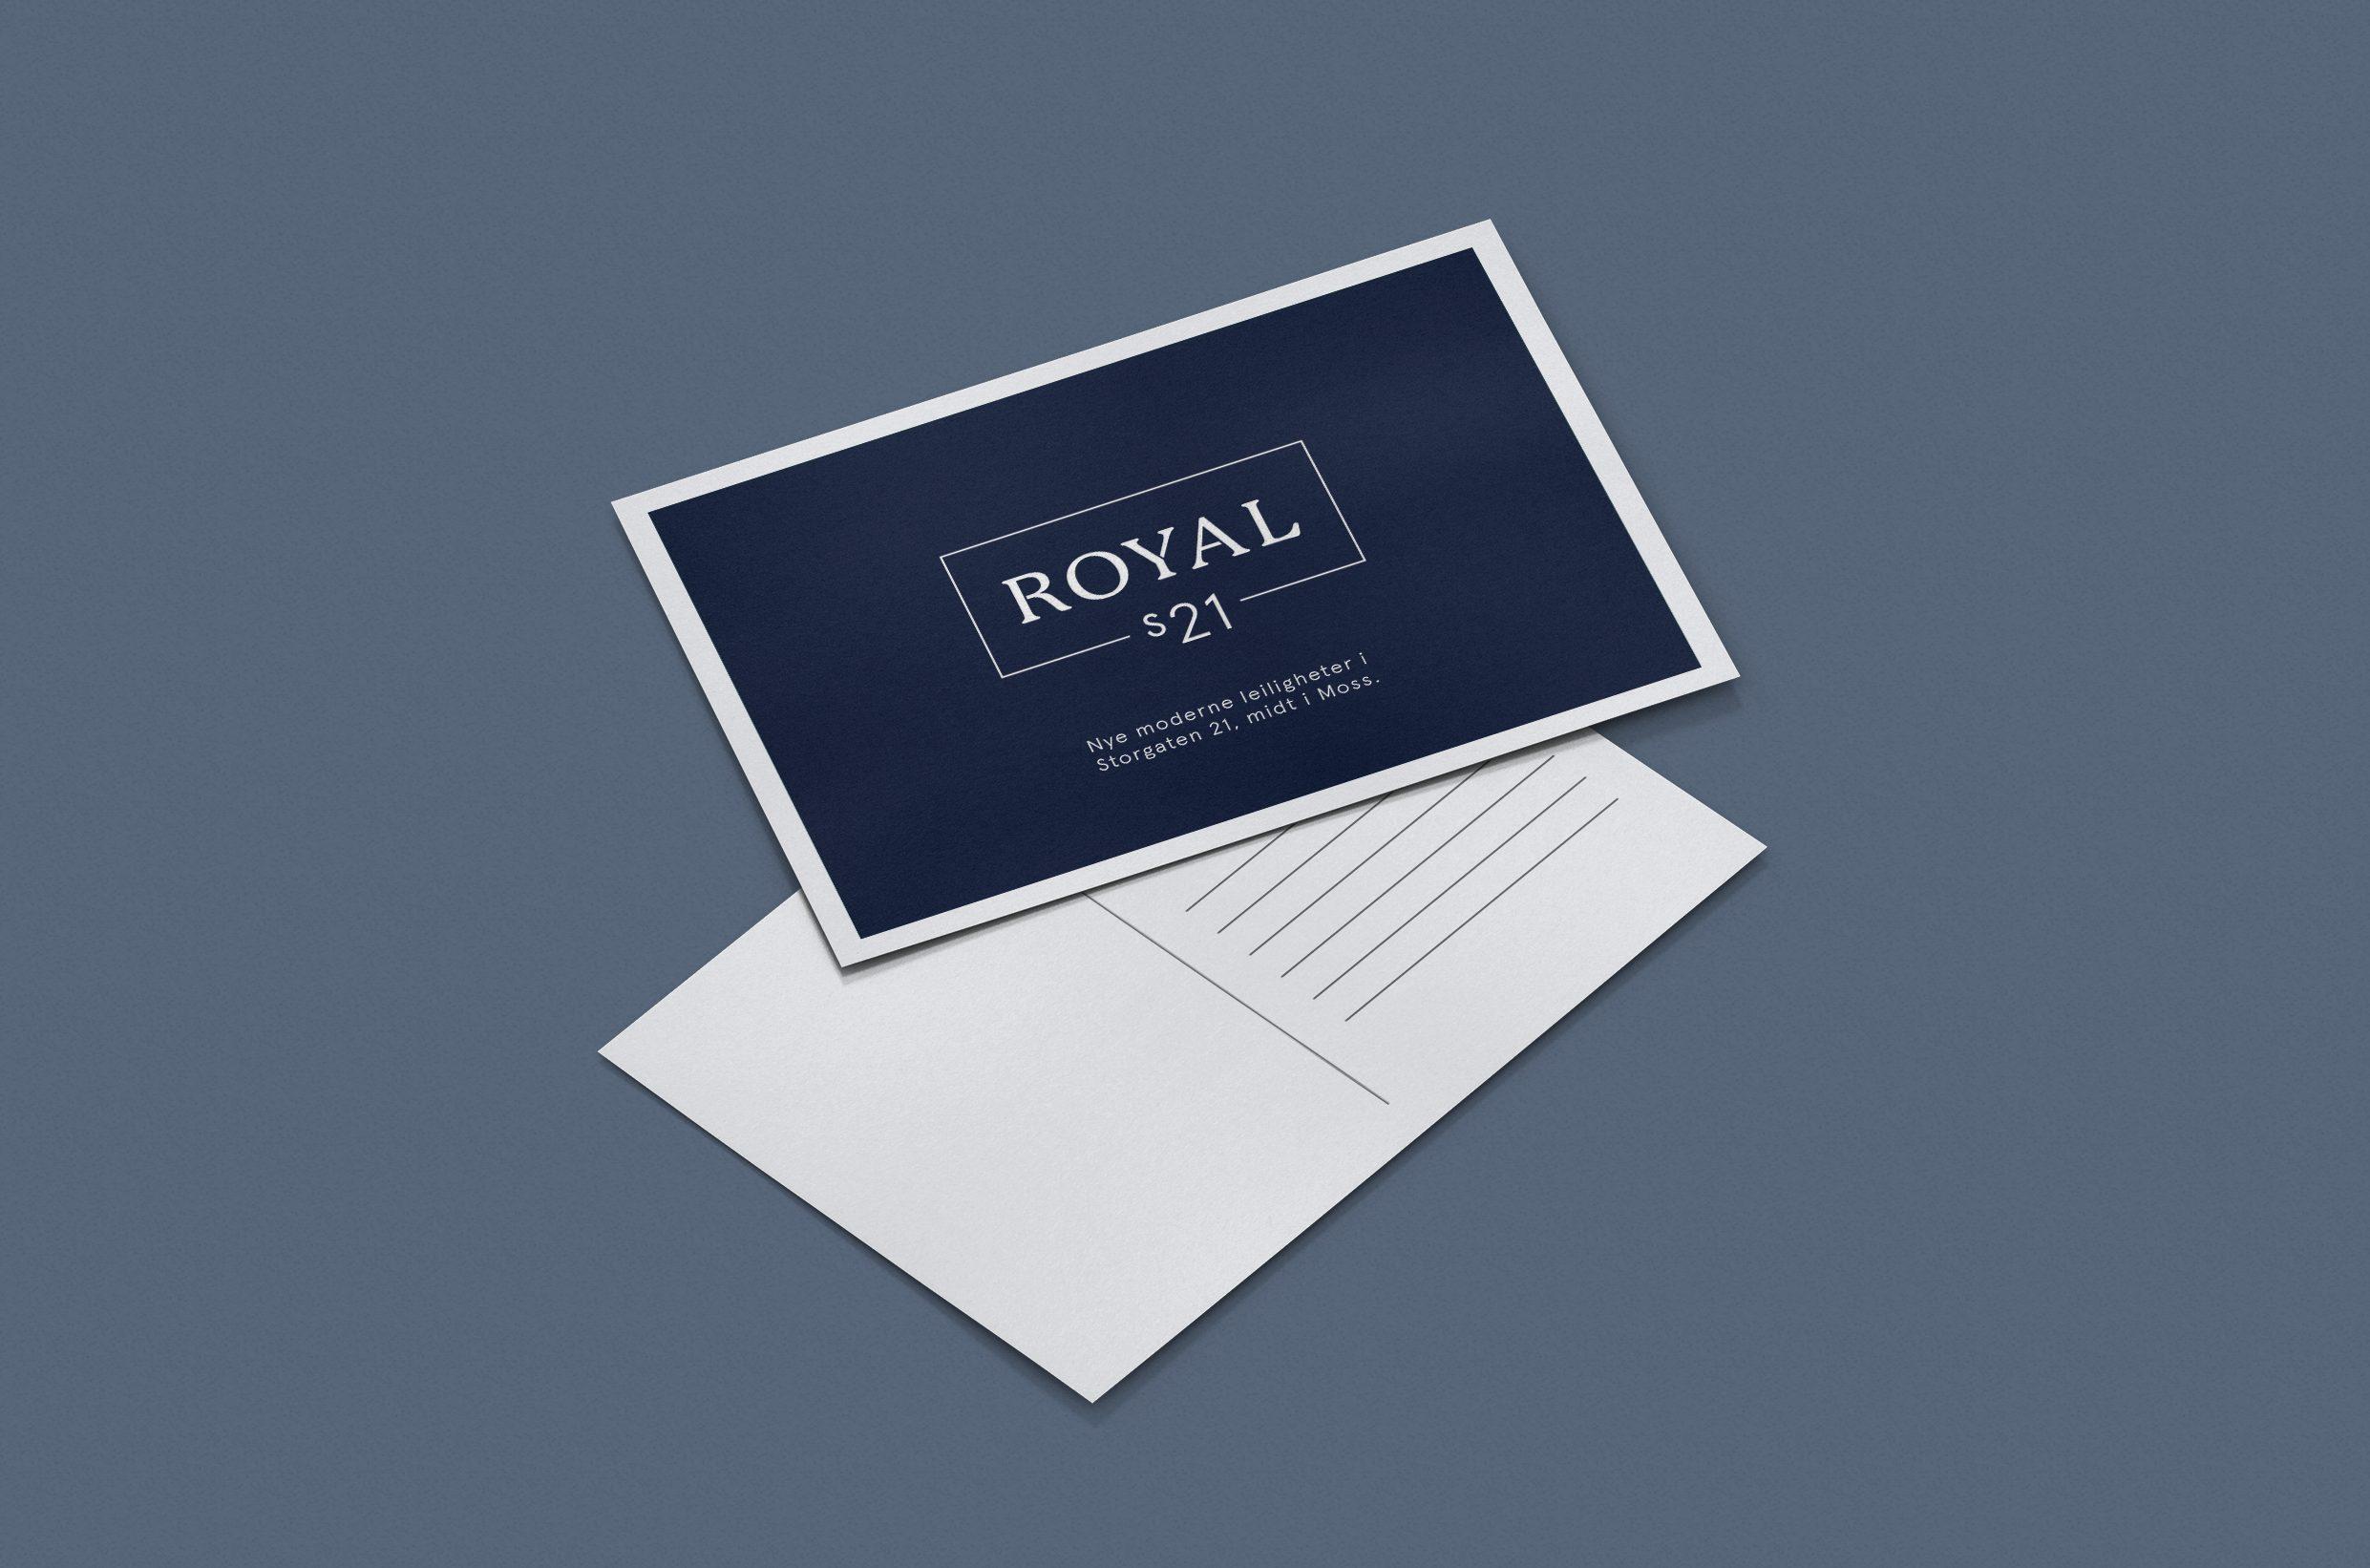 Royal S21 boligprosjekt nybygg eiendom logo grafisk profil identitet eksklusivt Moss